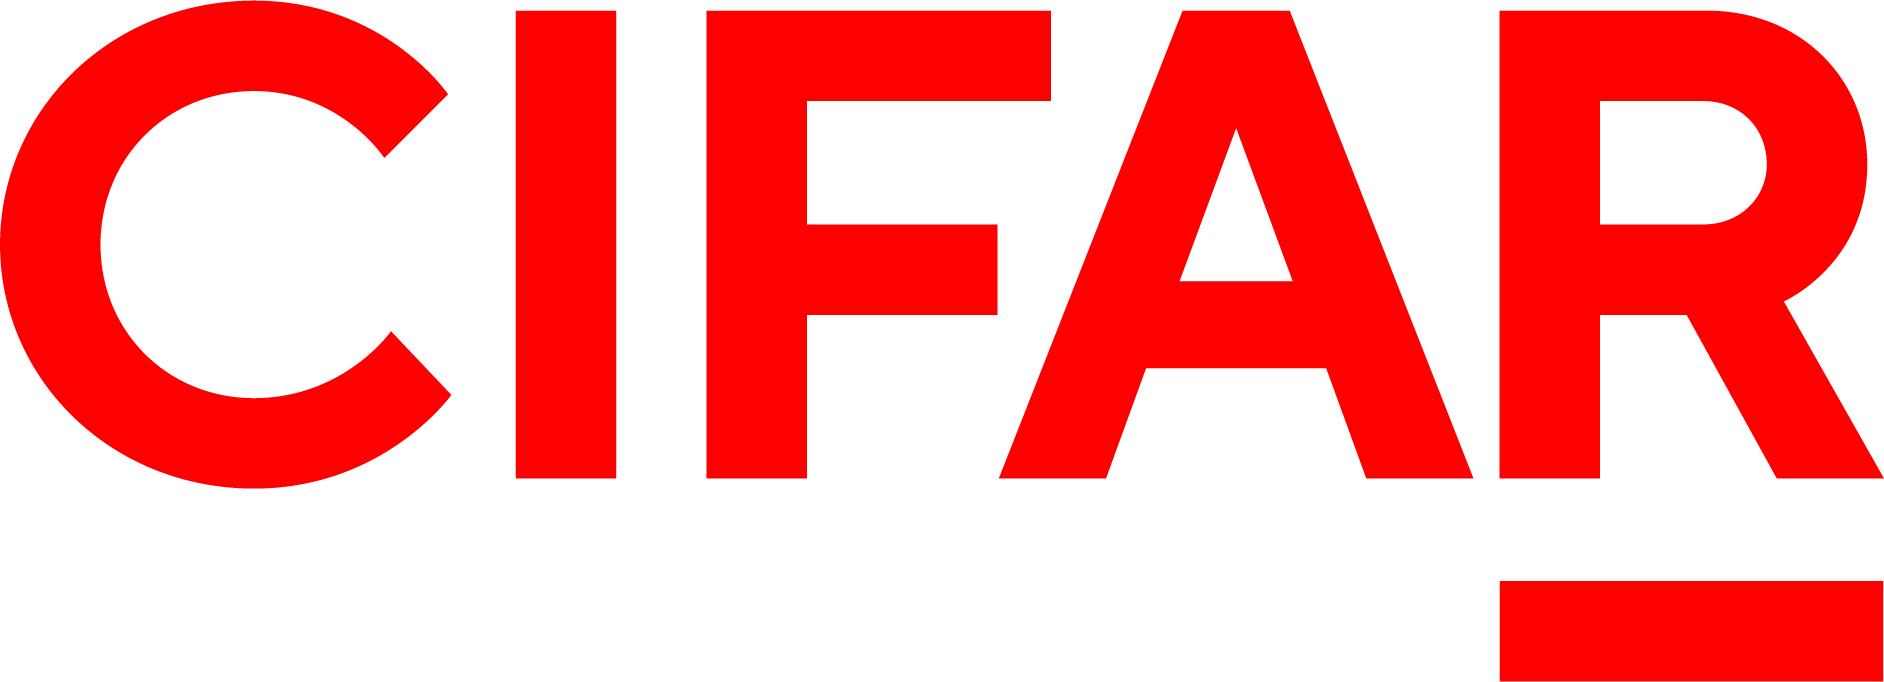 CIFAR-Logo-CMYK-Colour.jpg